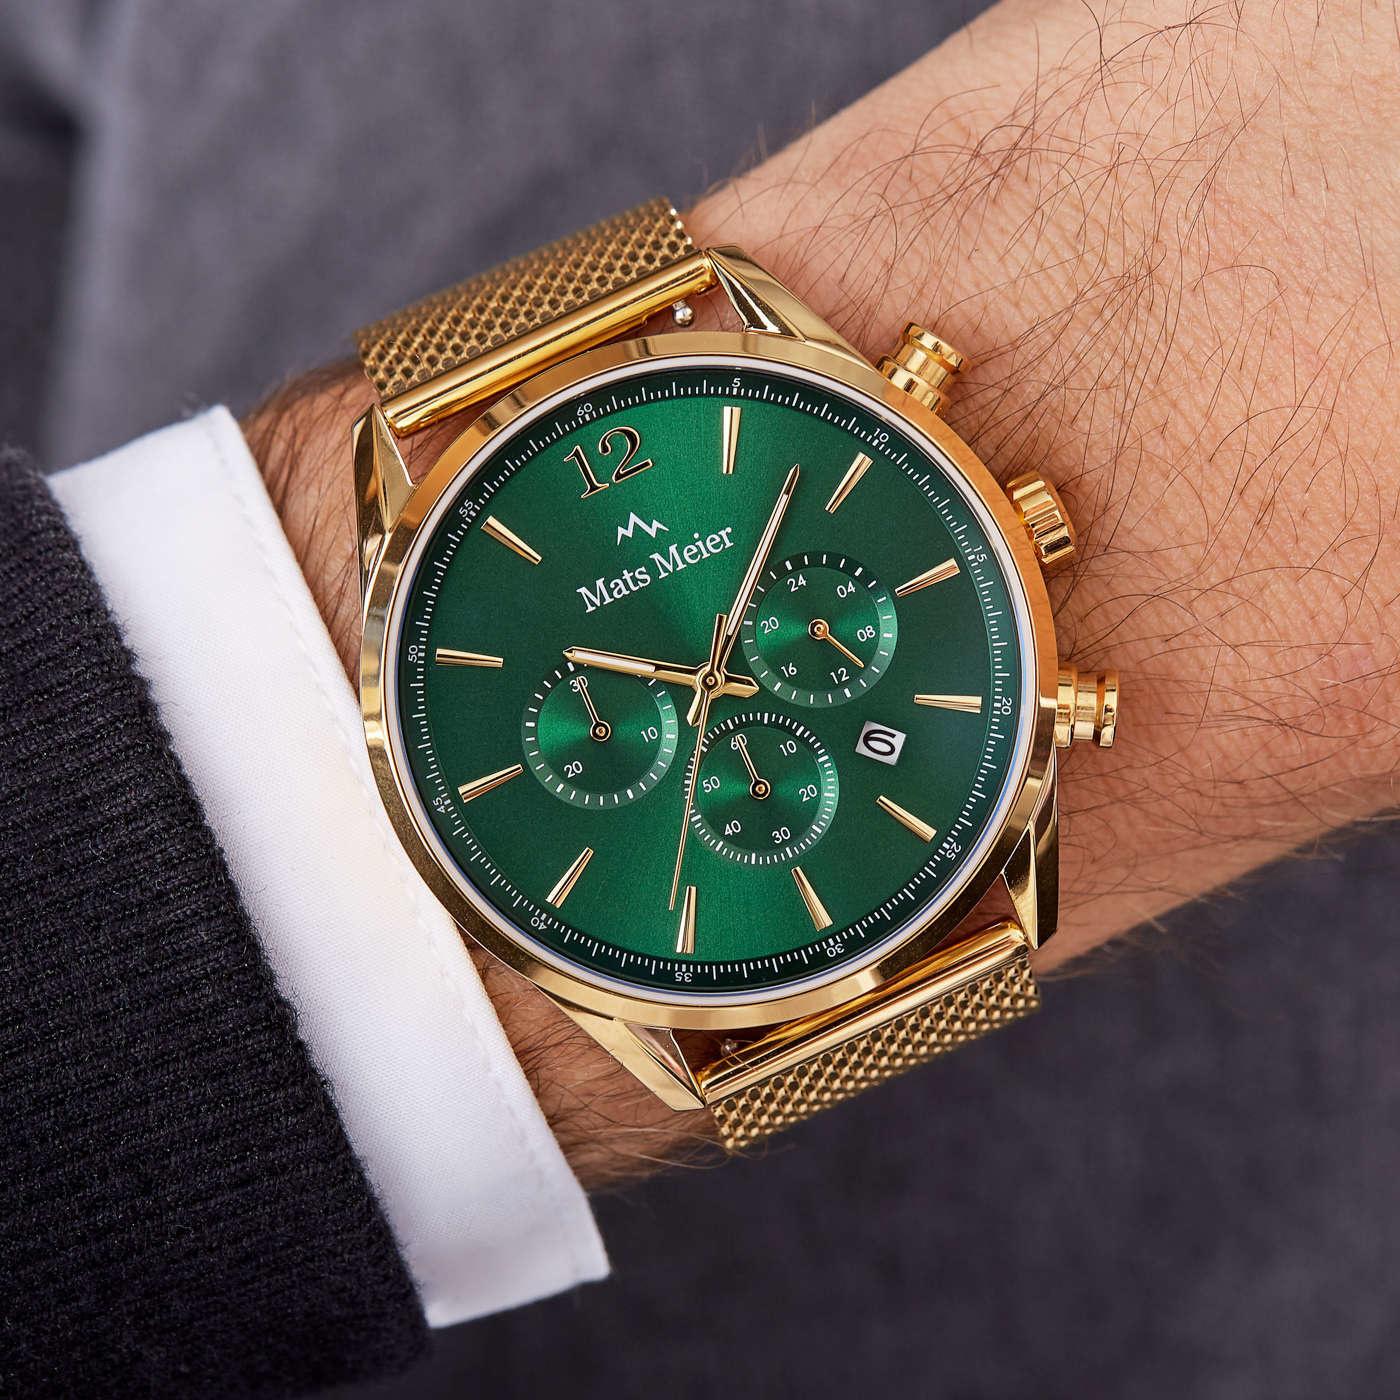 Mats Meier Grand Cornier kronografklocka grön/guldmesh